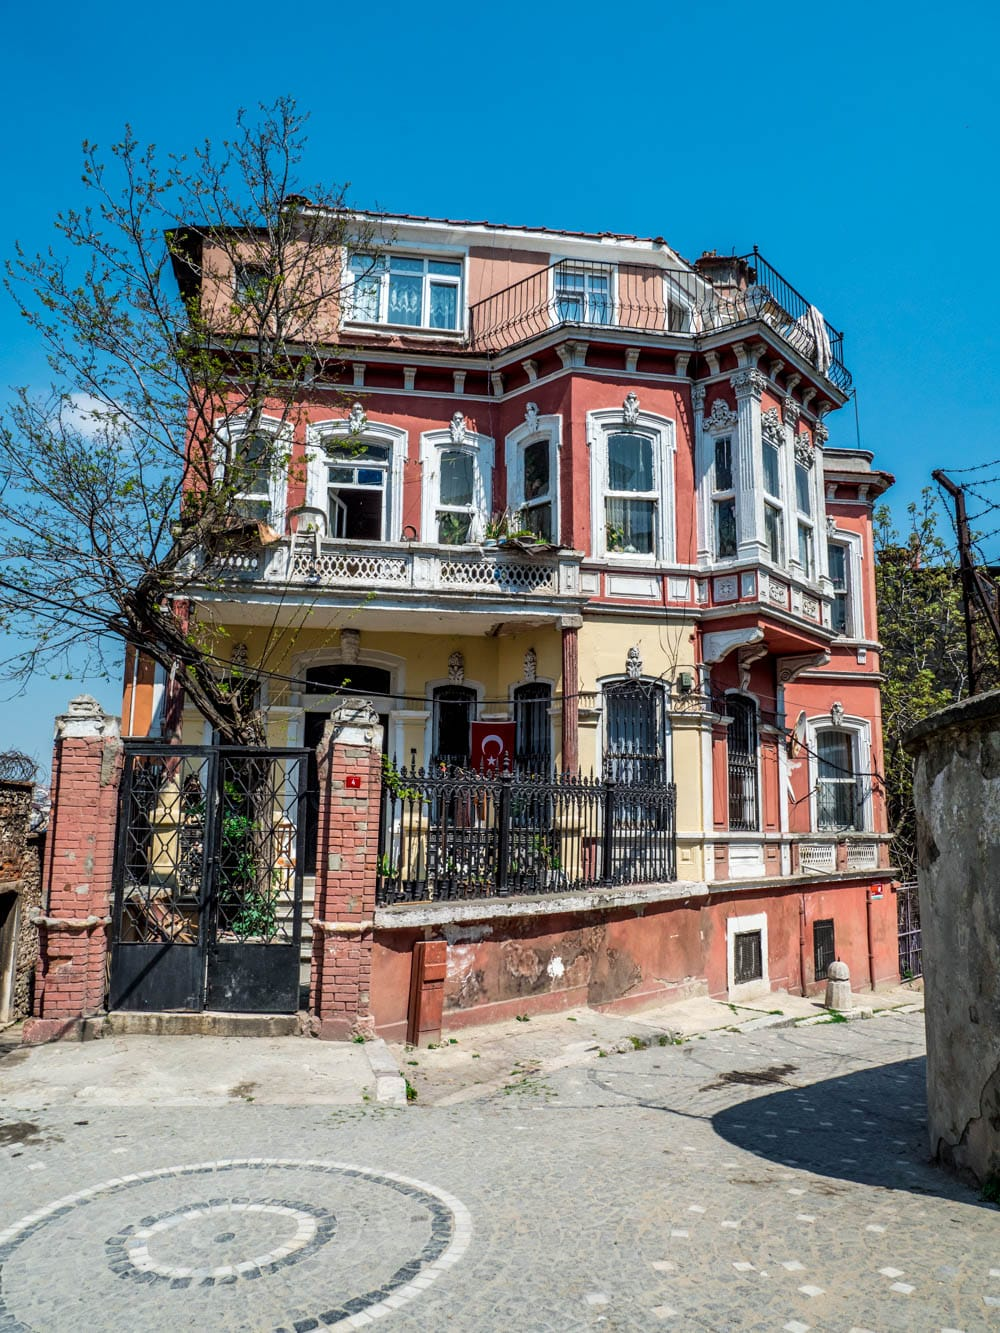 "Hus fra filmen ""The Water Diviner"" ved Fener / Balat, Istanbul"